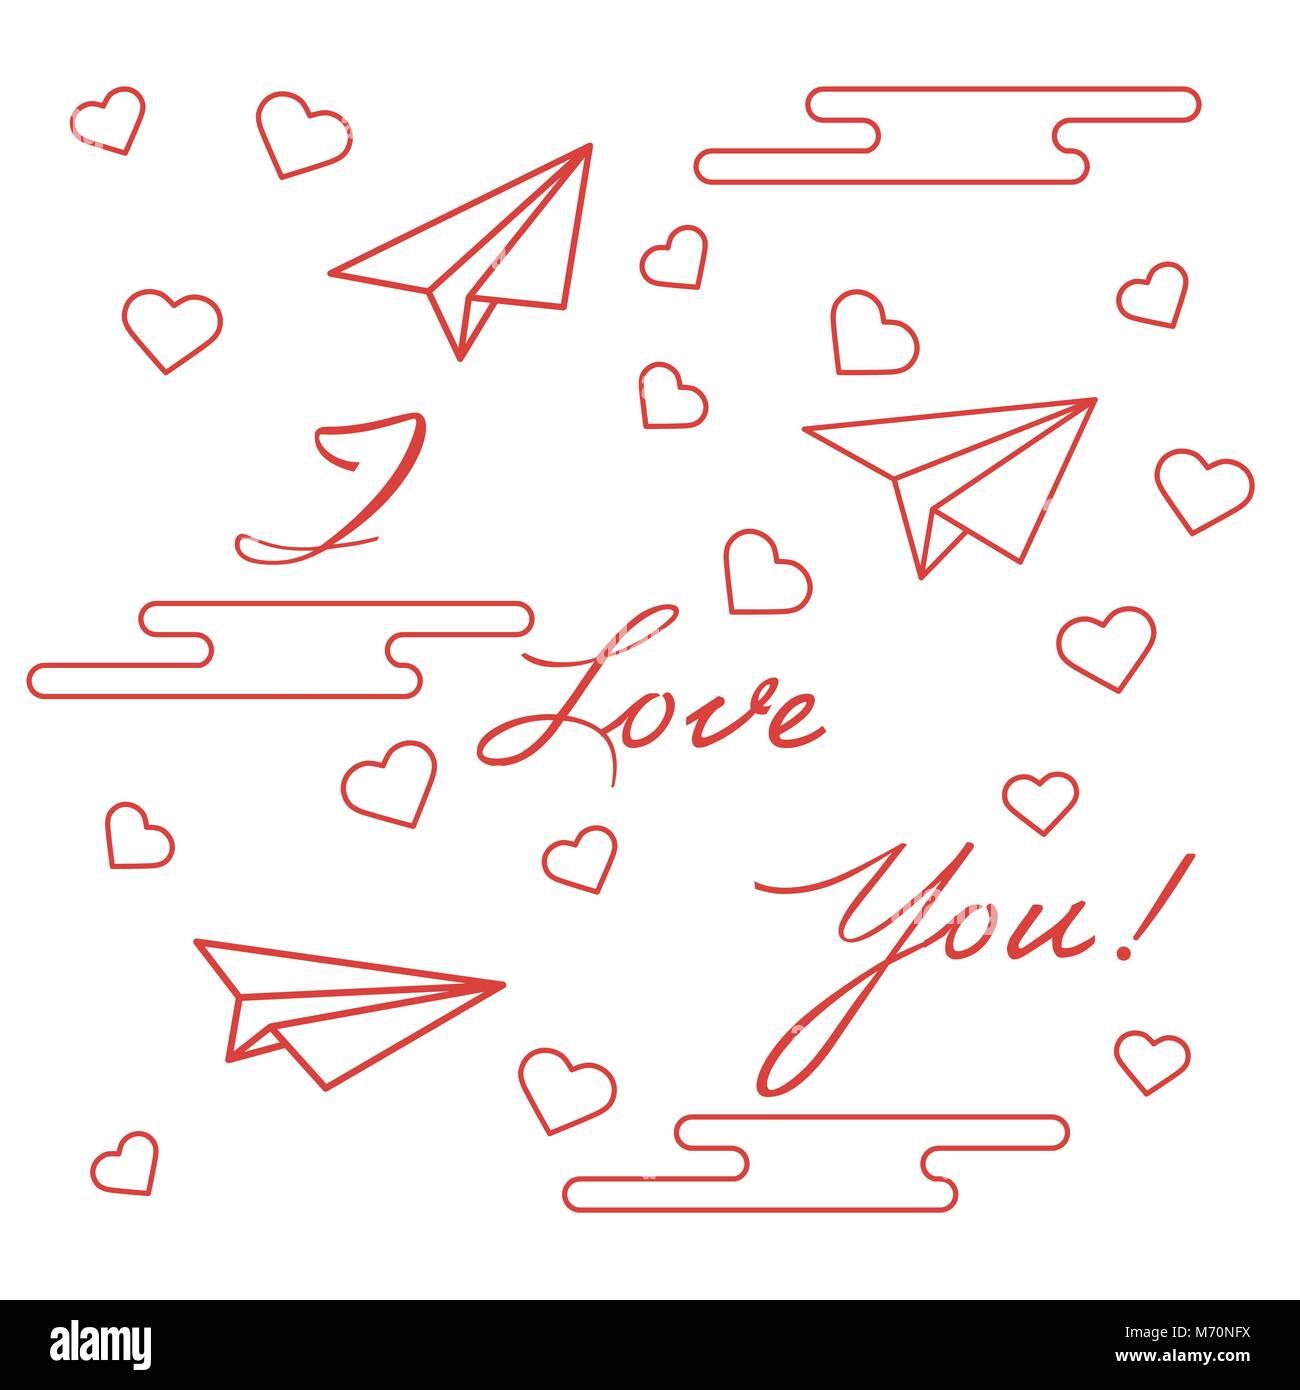 Paper Airplane Stockfotos & Paper Airplane Bilder - Seite 23 - Alamy